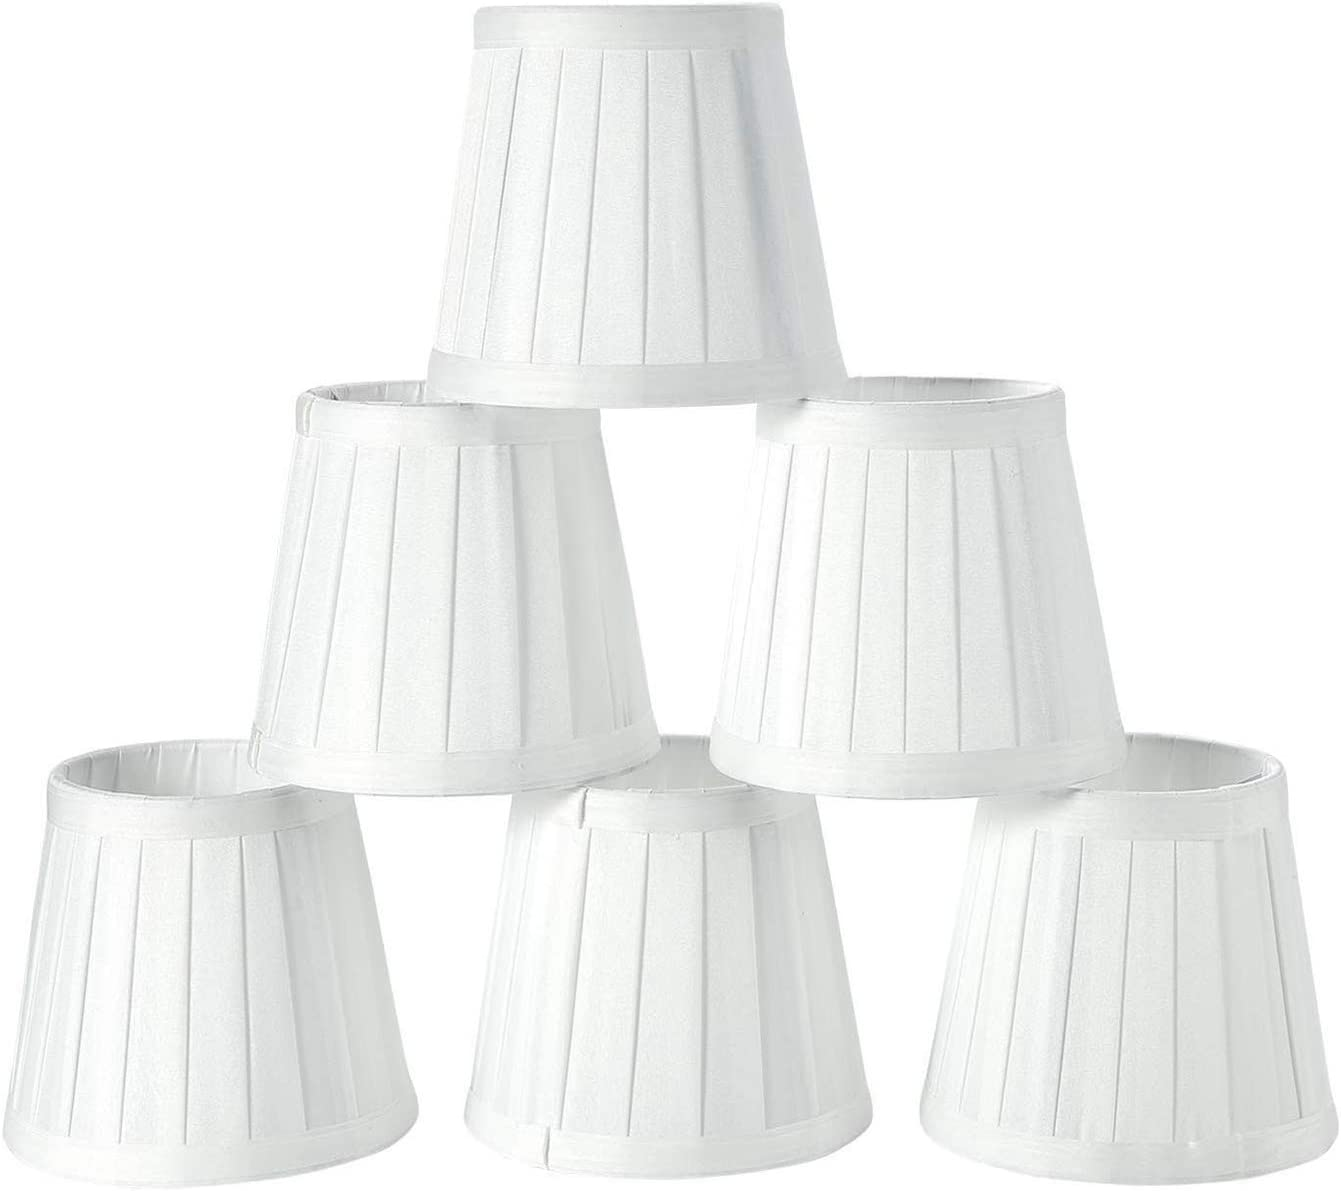 Bestlymood Paralume Moderno Lampada Da Parete Droplight Stile Europeo Candela Paralume 6 Pezzi Set Bianco Solido